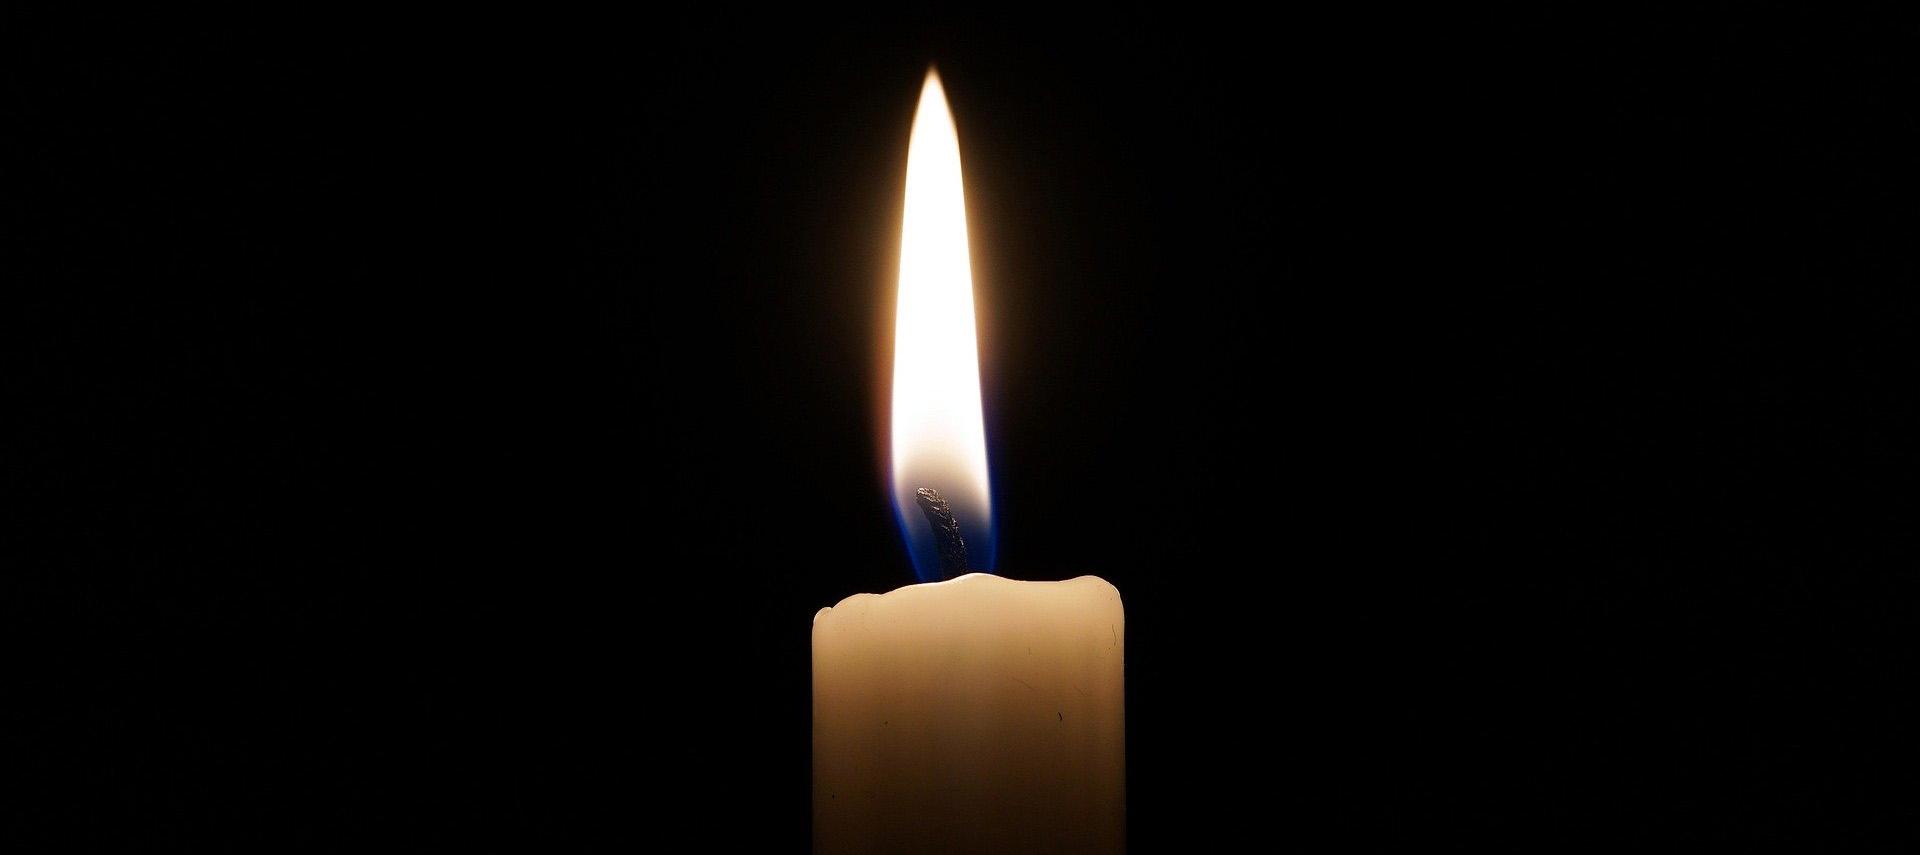 candle-2038736_1920_1